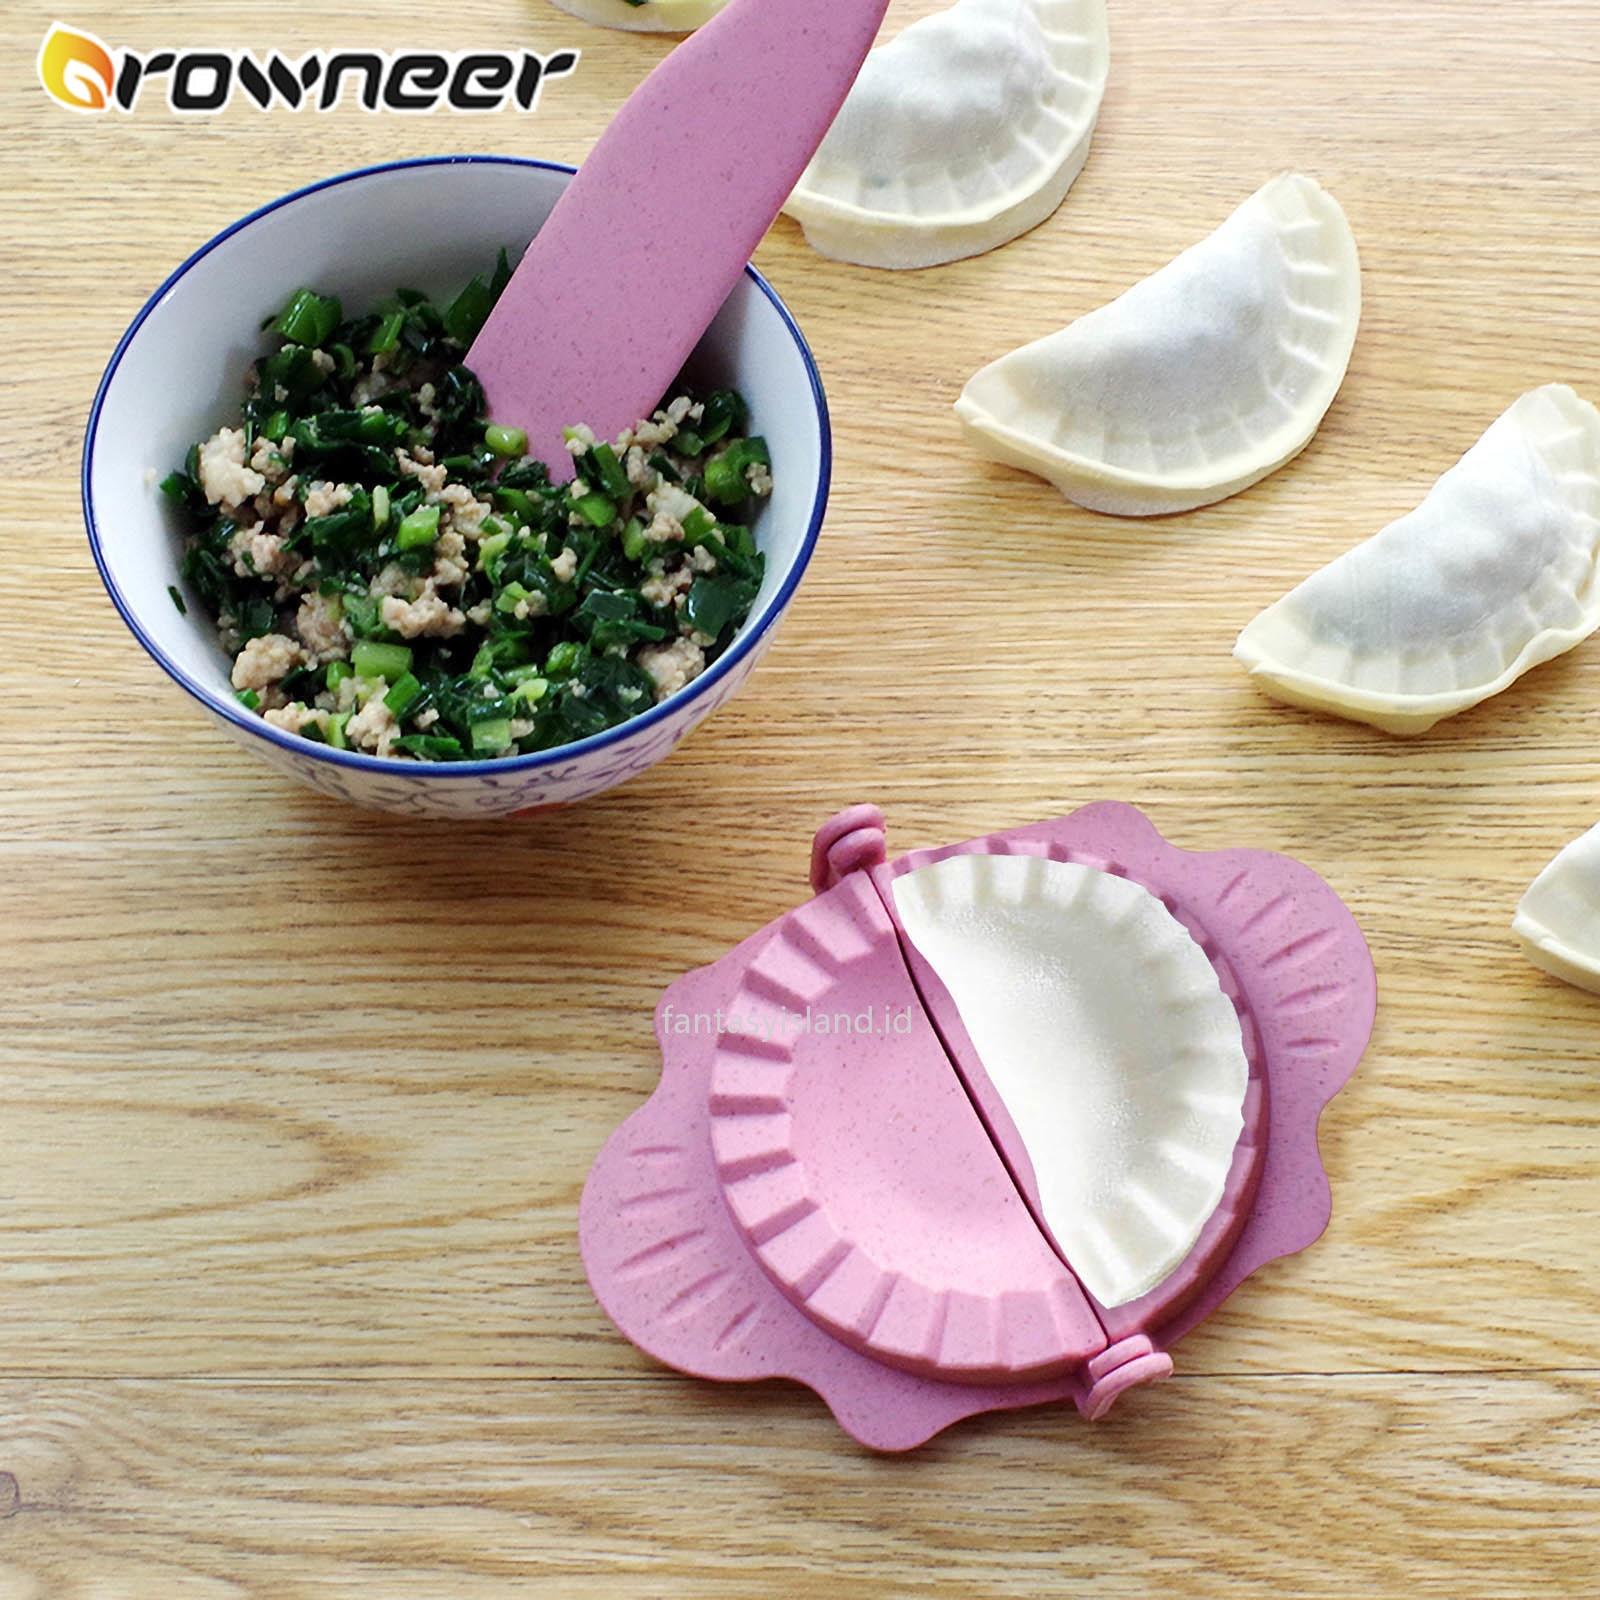 DIY Dumplings Mold Non-toxic Wheat Straw Jiaozi Molds Convenient Dumpling Maker Kitchen Round Face Peel Automatic Pastry Gadgets